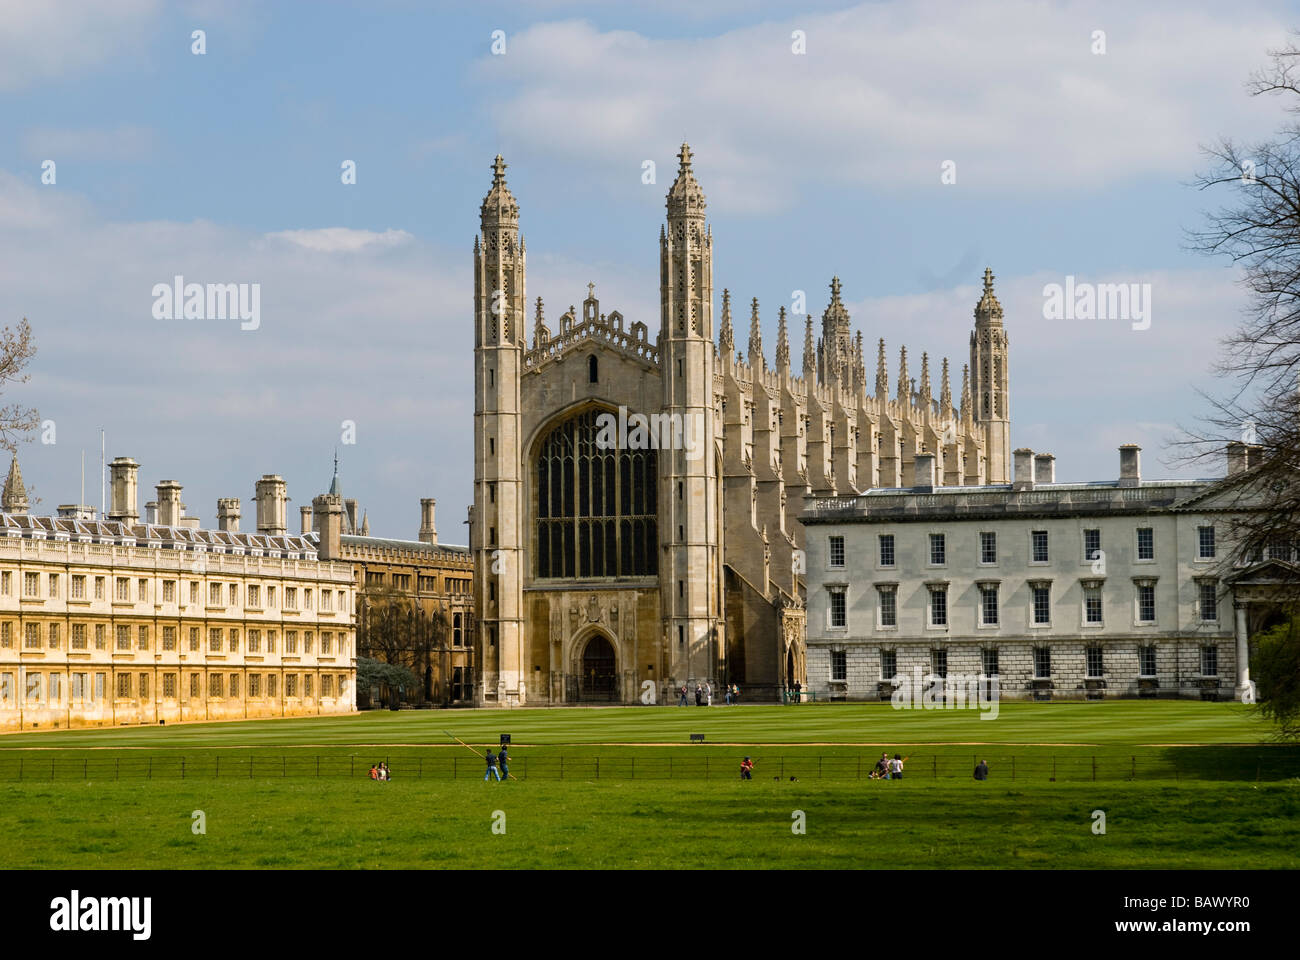 King's College Chapel Cambridge University - Stock Image